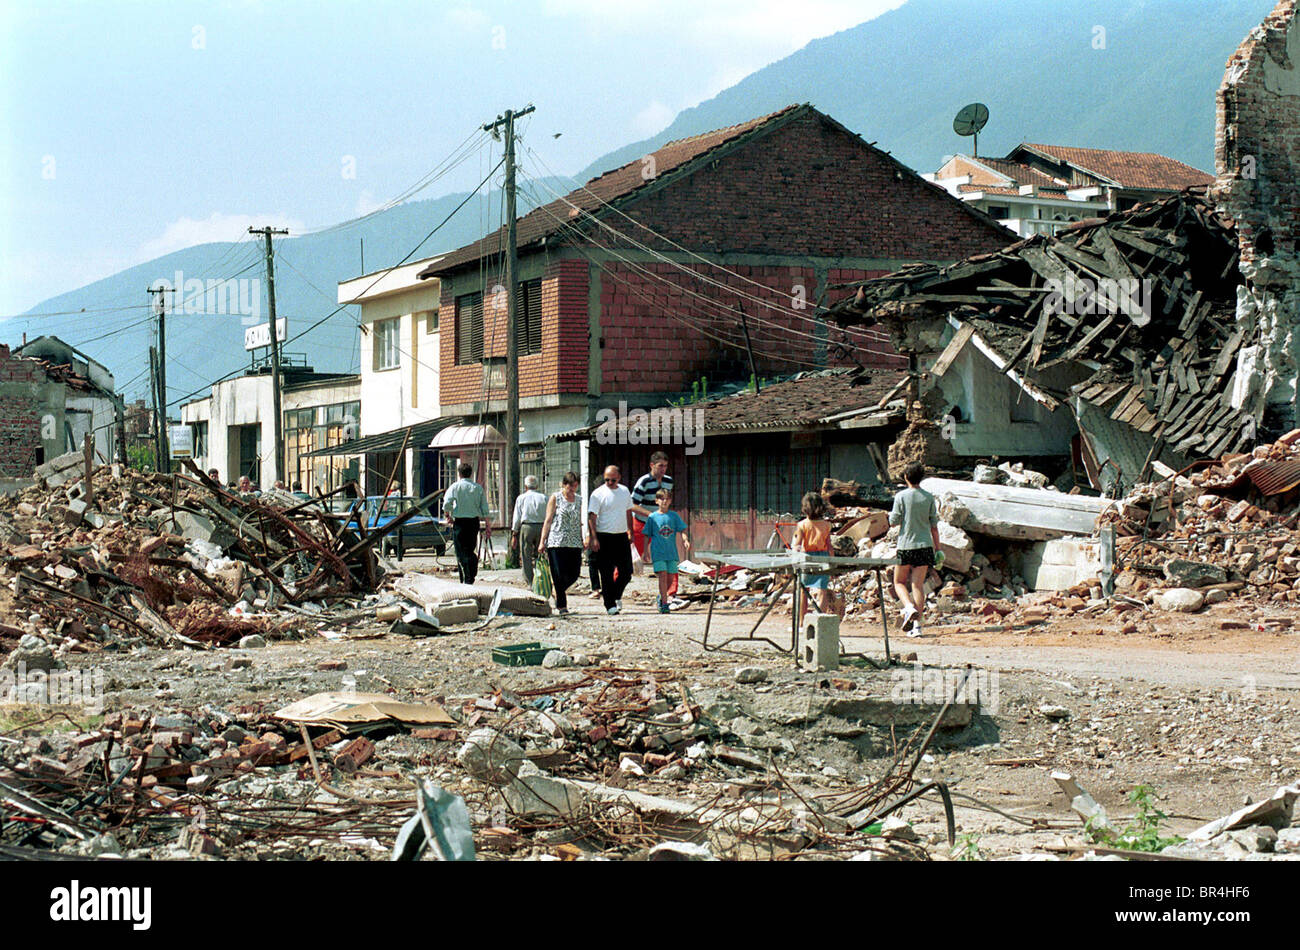 A view of the destruction of Peja, Kosovo. Stock Photo